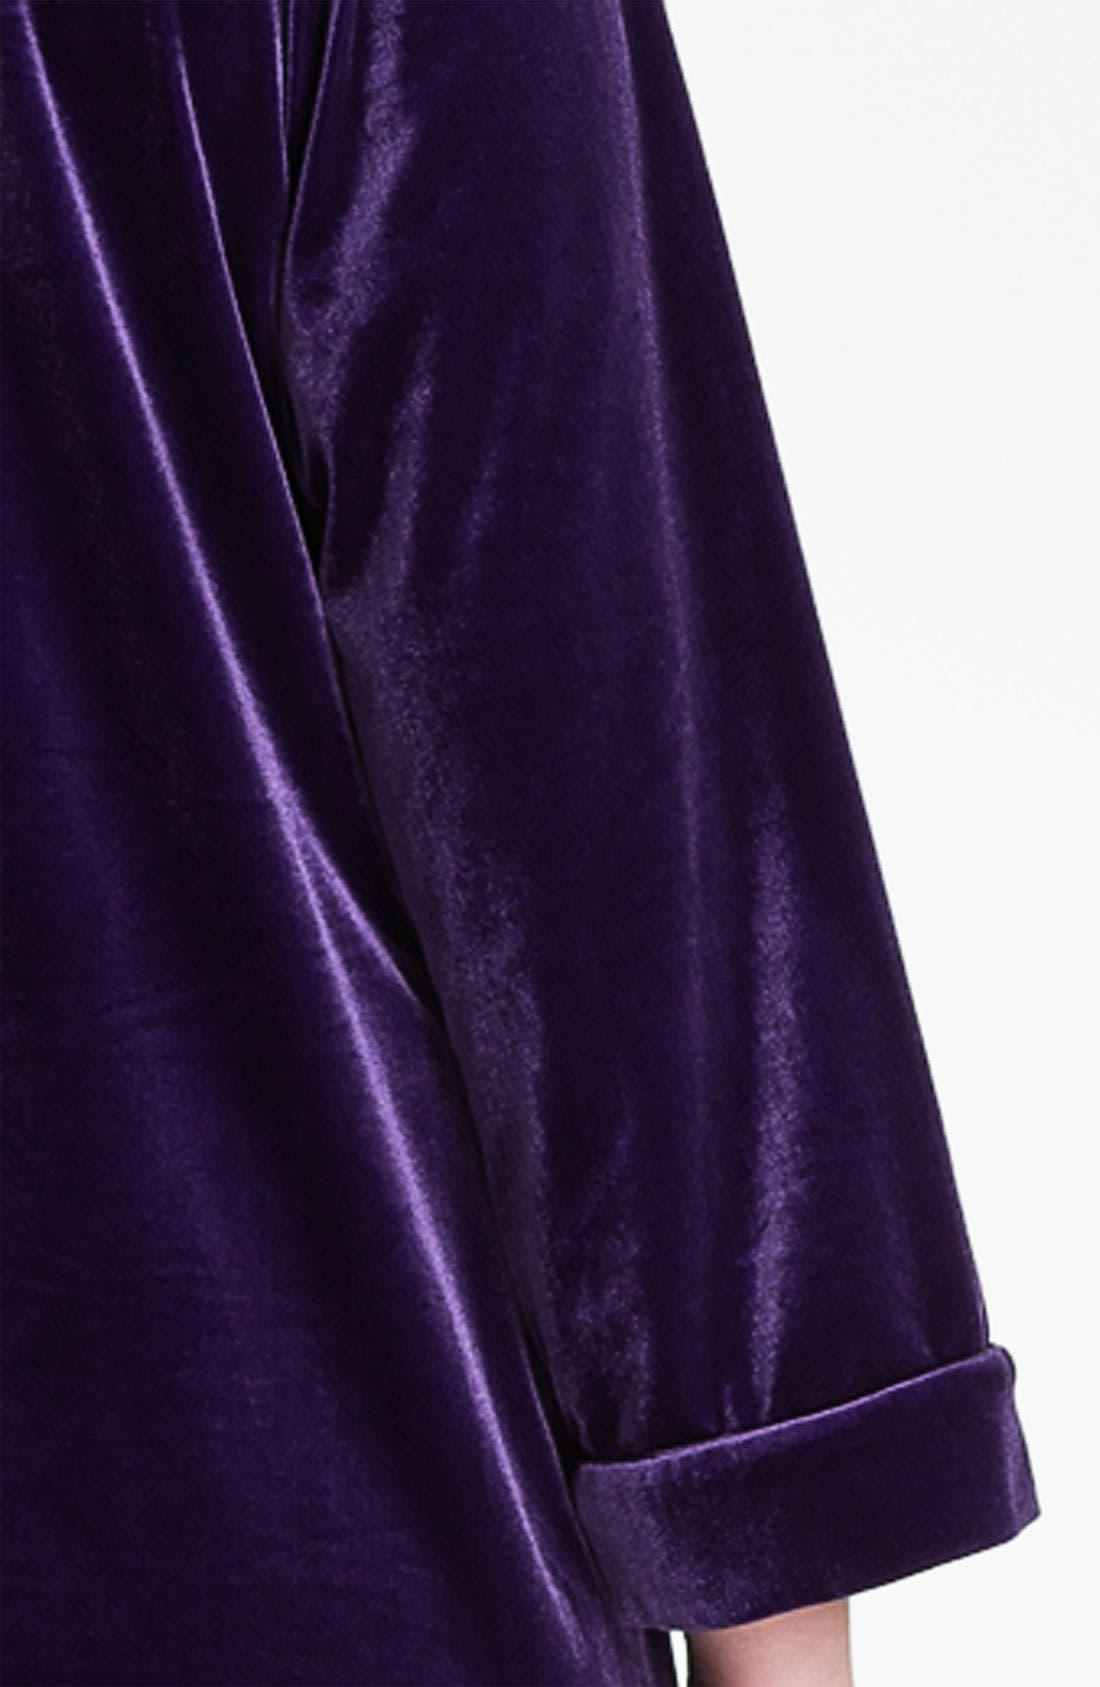 Sleepwear 'Zahara Nights' Robe,                             Alternate thumbnail 4, color,